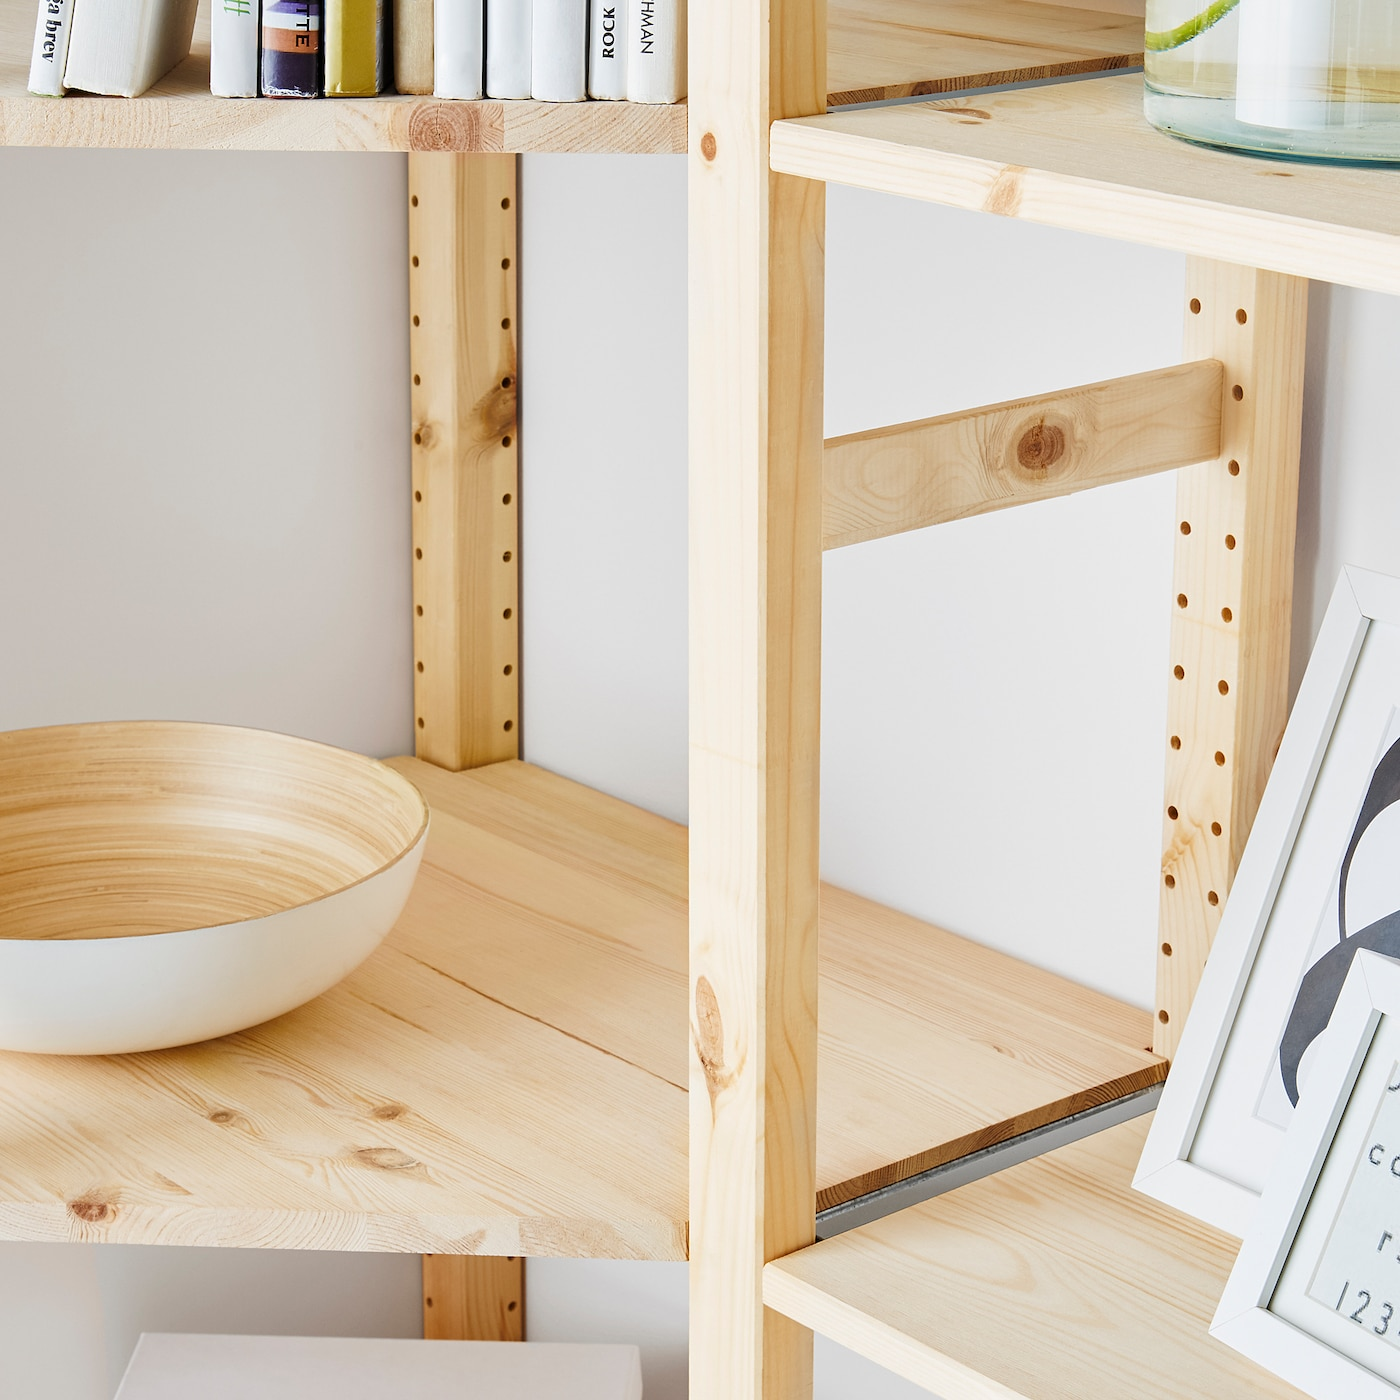 Ikea Scaffali Legno Ivar ivar 4 sezioni/angolo - pino 229/144x30x179 cm